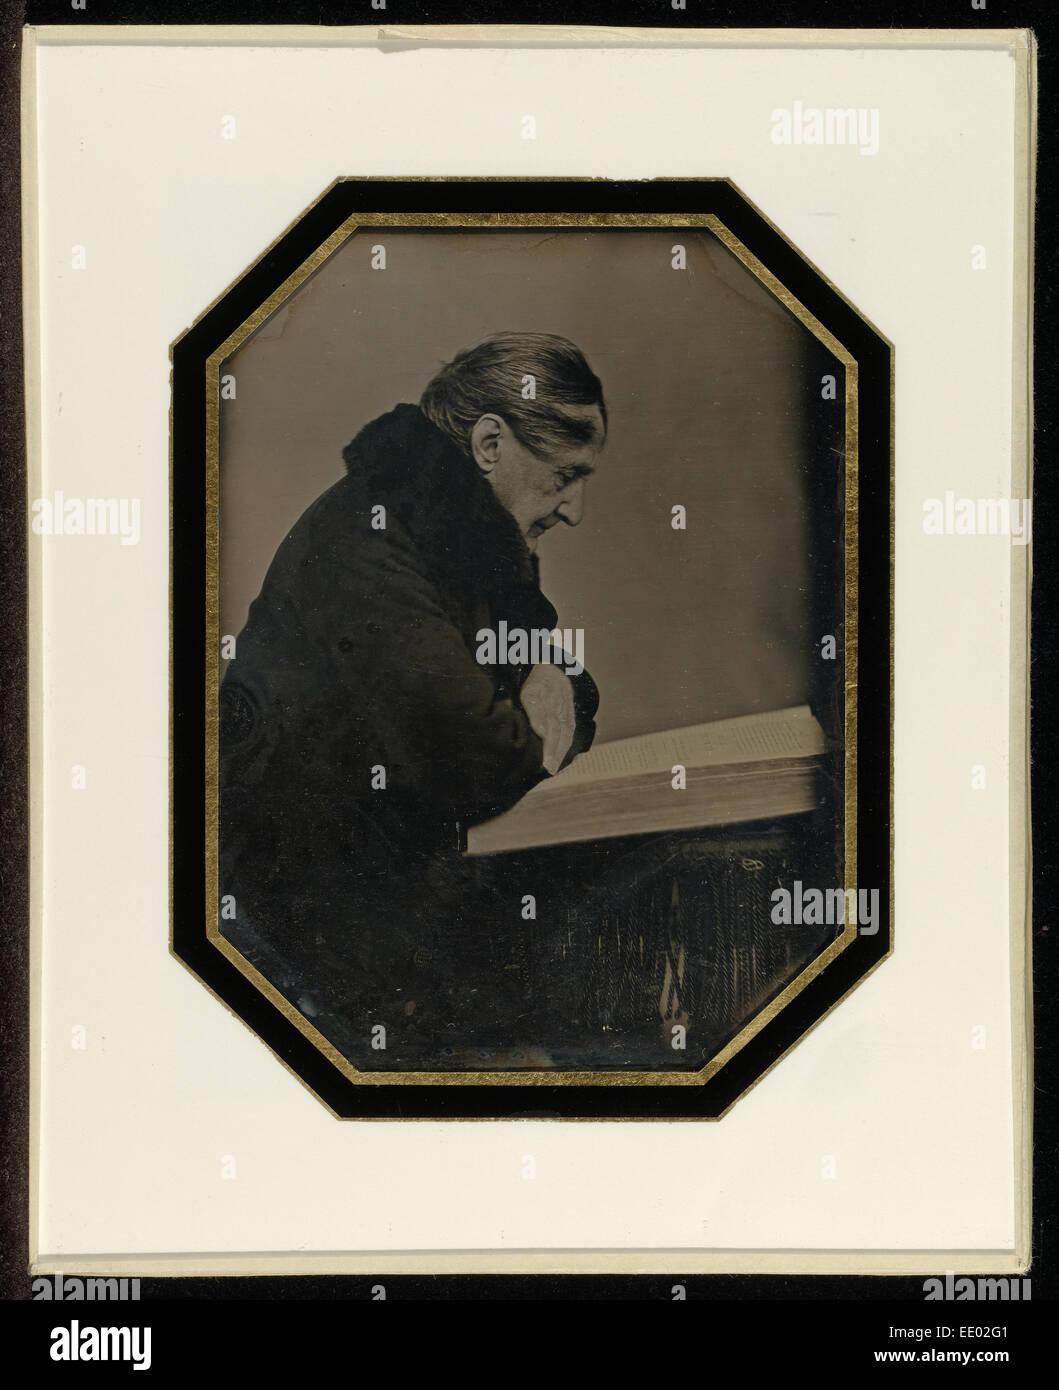 Autoritratto con un volume in Folio; Jean-Gabriel Eynard, Svizzera, 1775 - 1863; circa 1845; Daguerreotype Immagini Stock